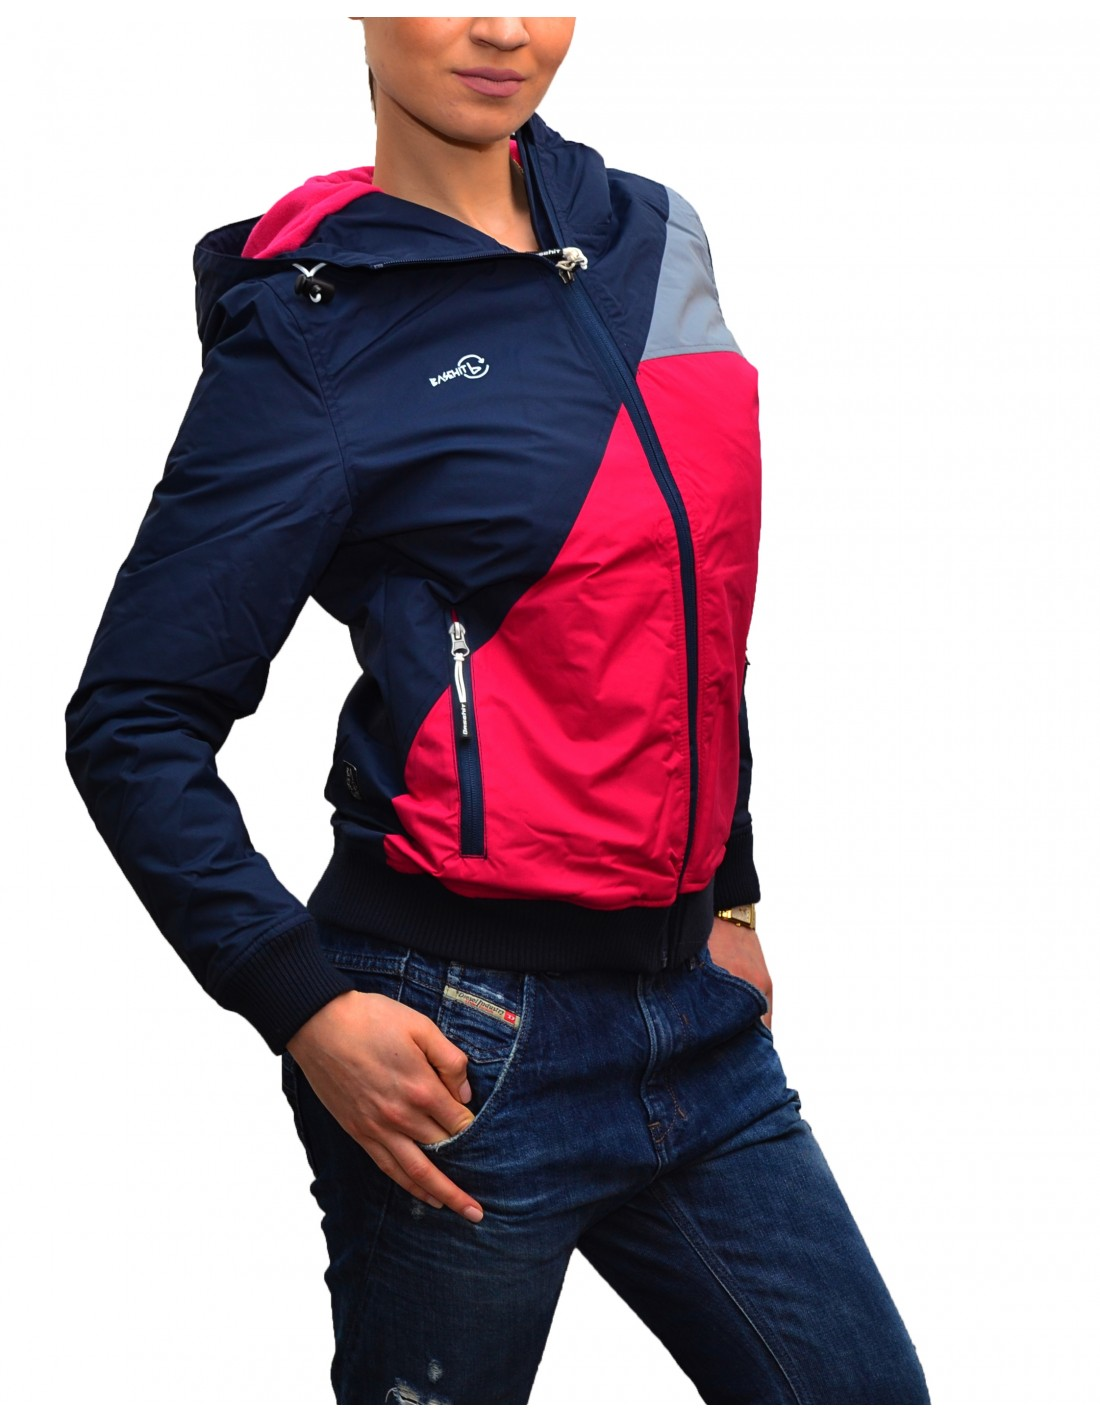 32d210884020 Basehit Γυναικείο Μπουφάν Navy/Rose W1639N